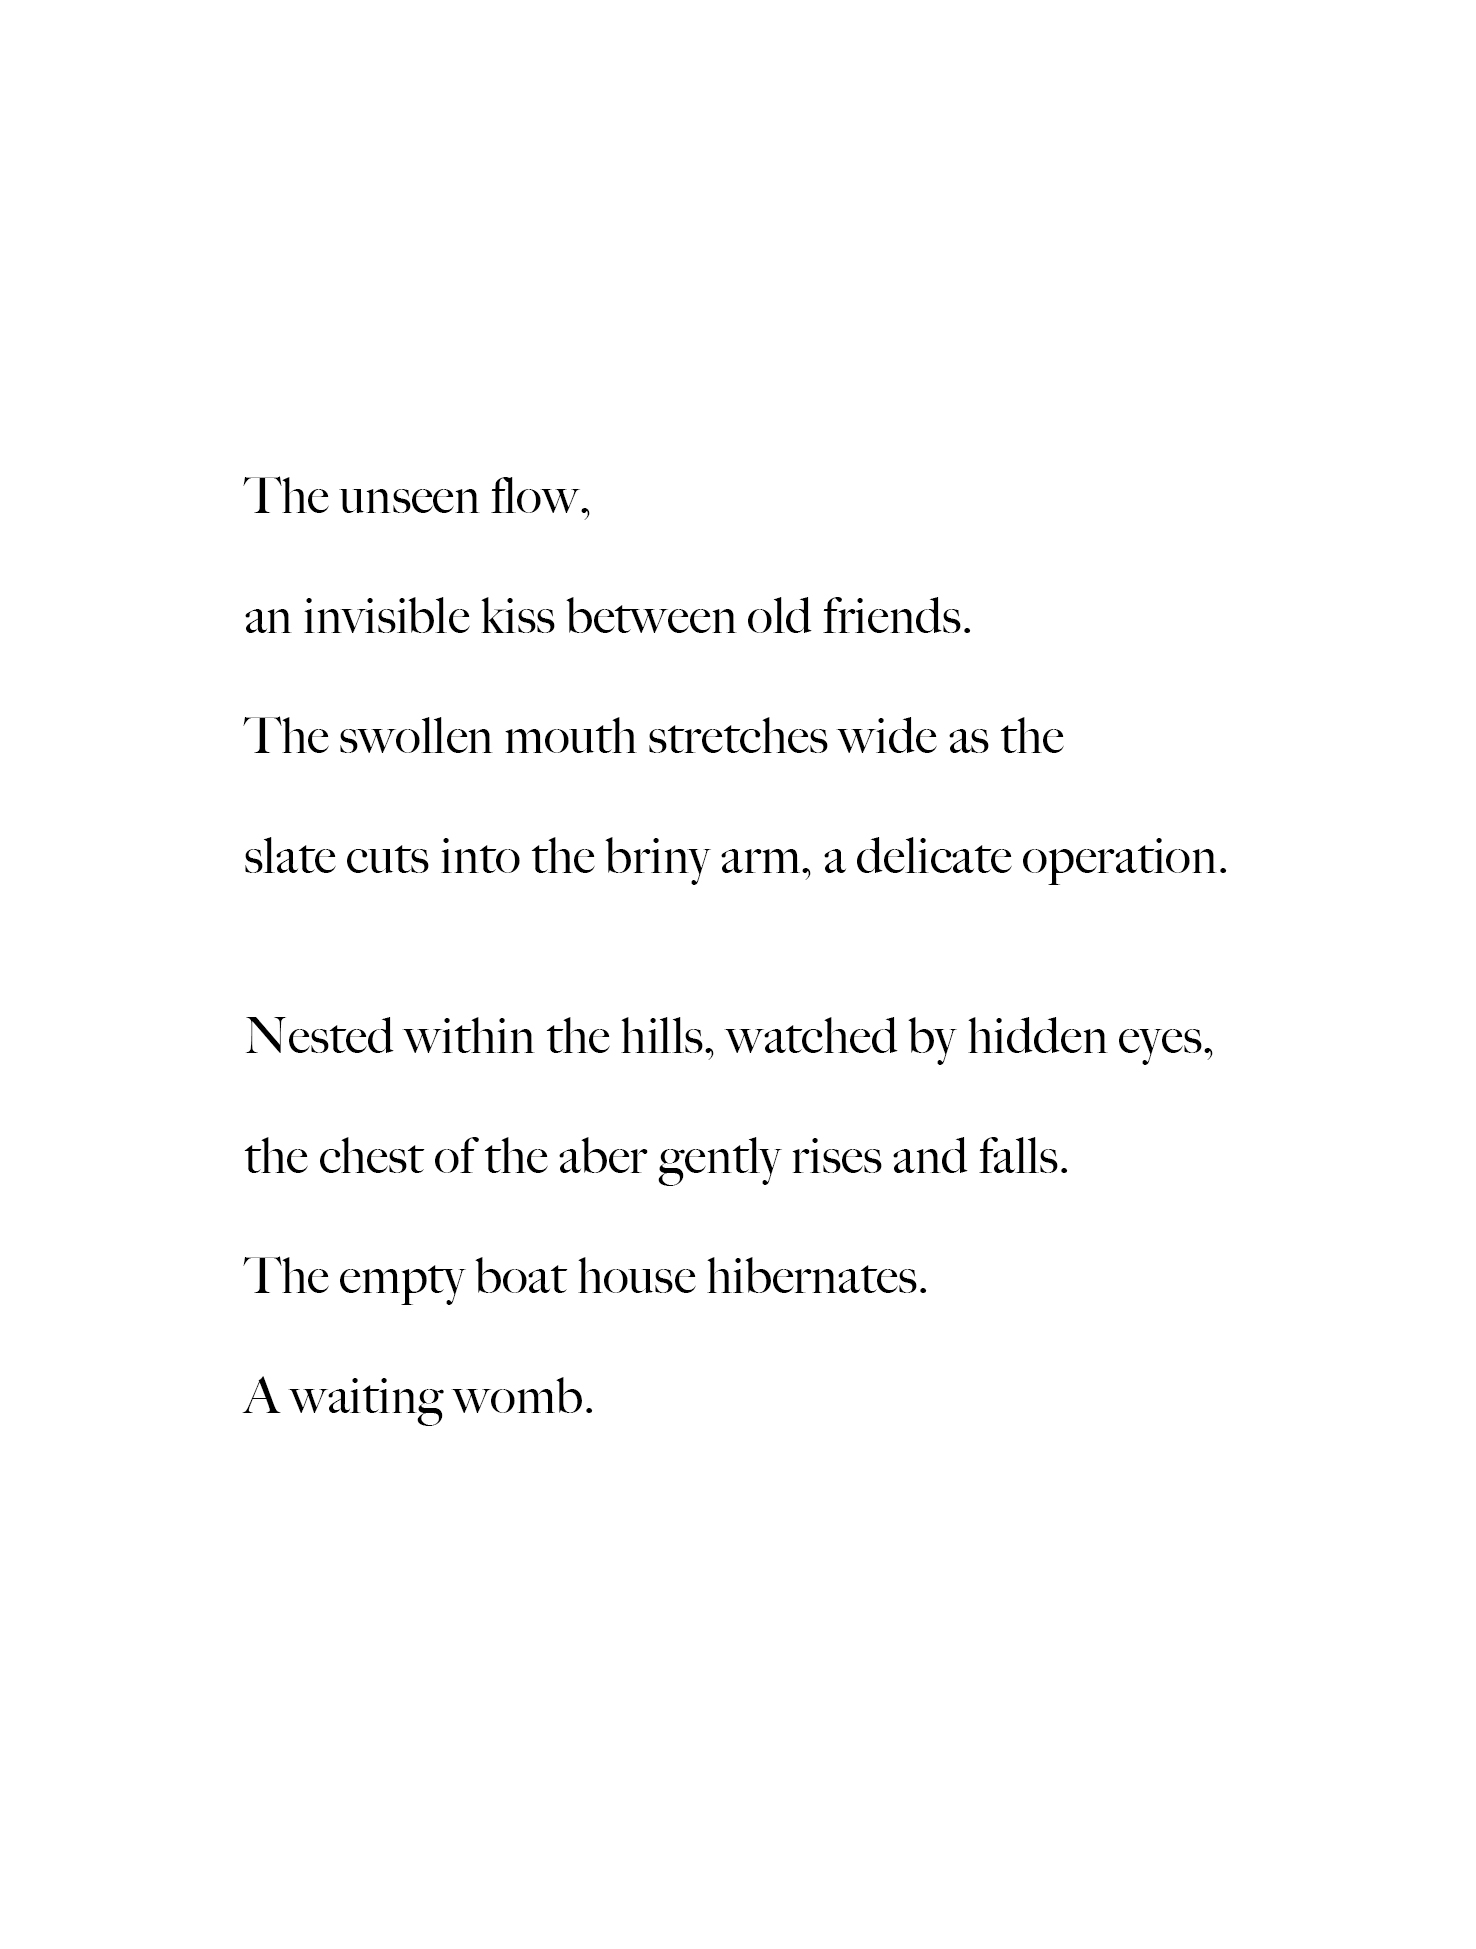 The Aber poem 4.jpg